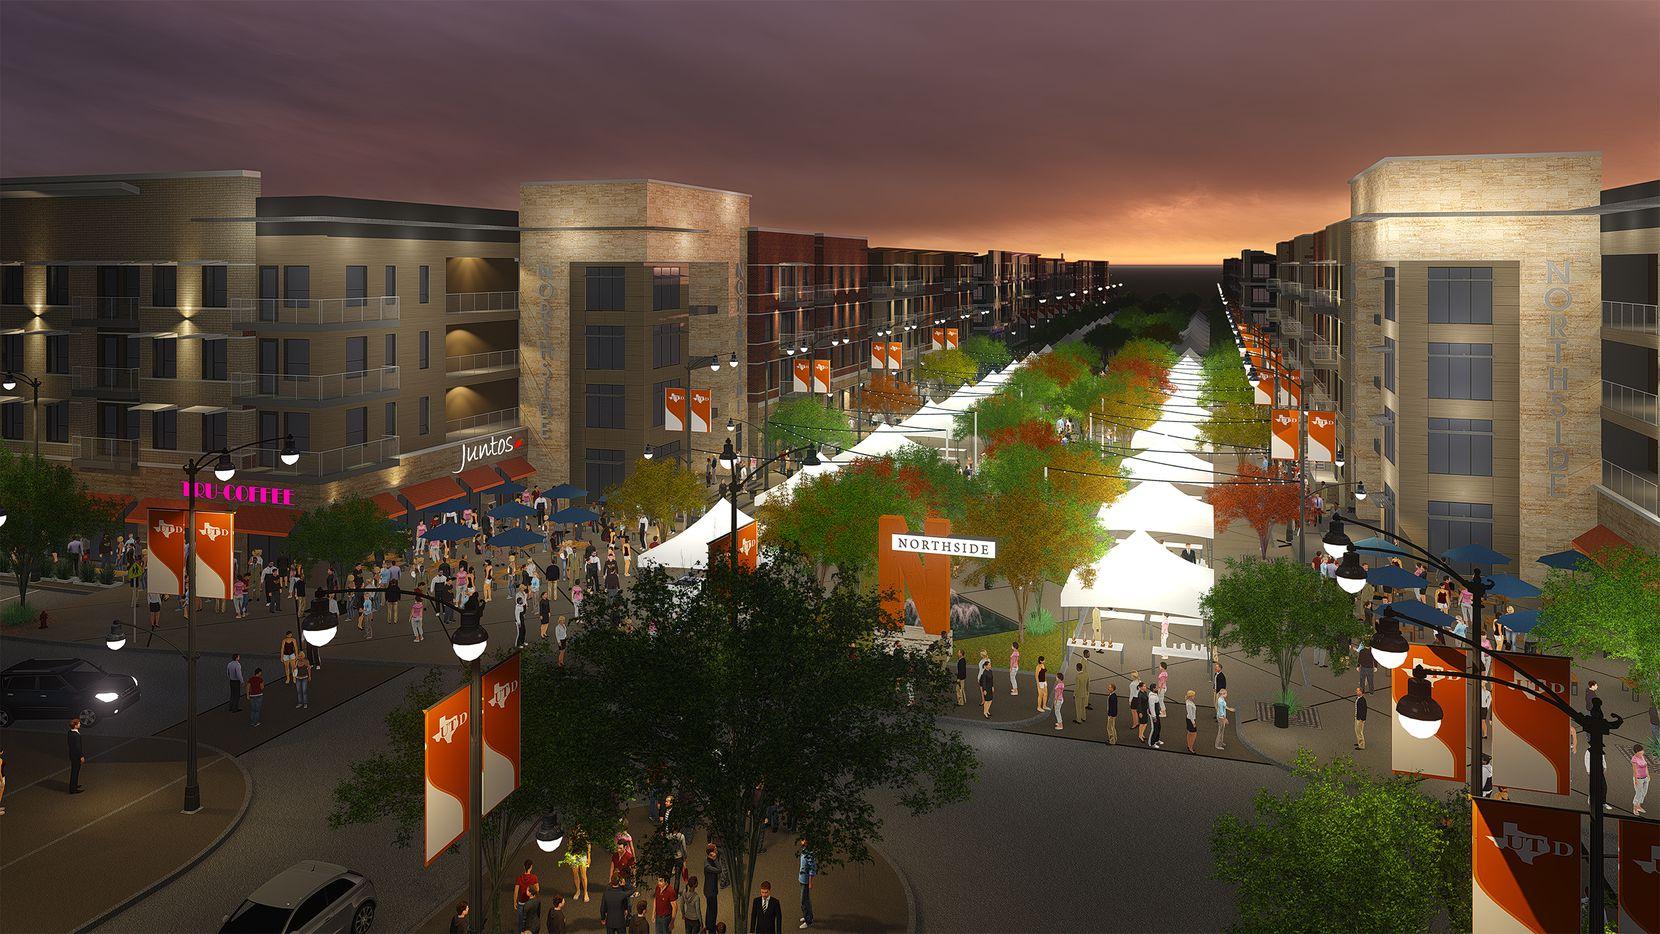 The first phase of UTD's Northside development opened last summer.